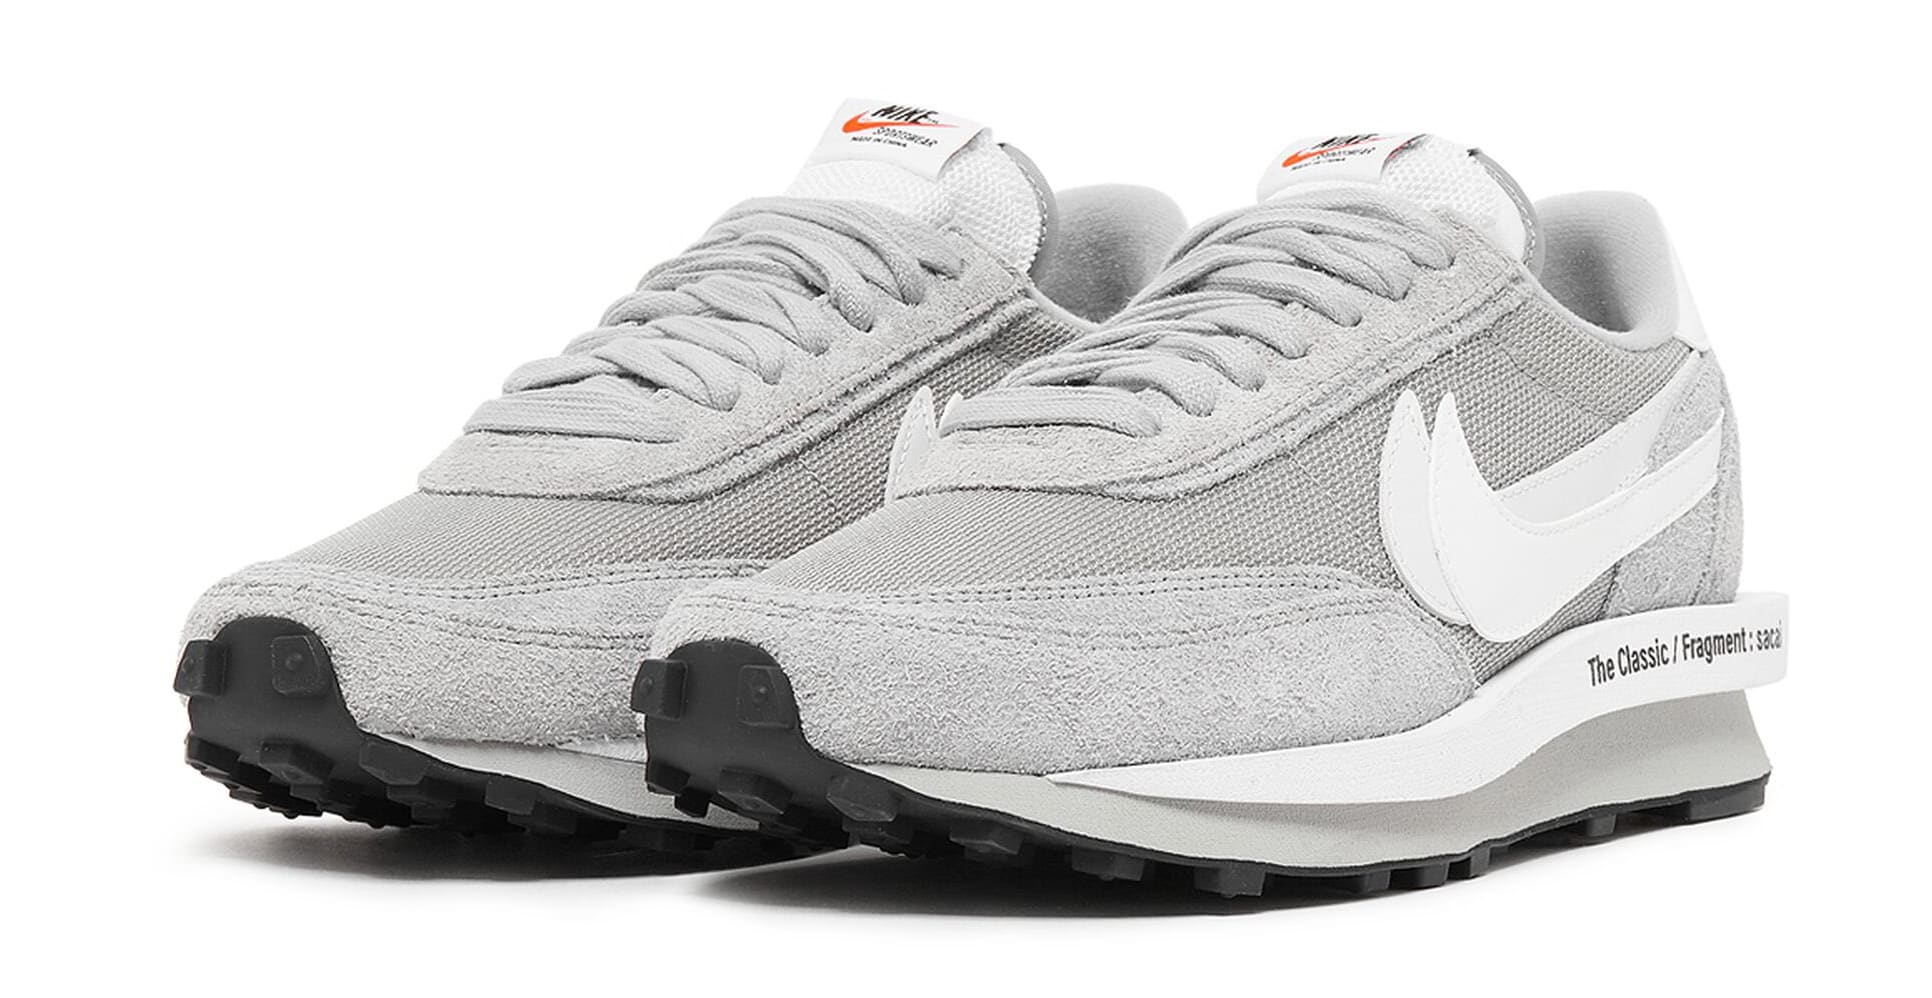 Fragment x Sacai x Nike LDWaffle 'Grey' DH2684-001 Pair